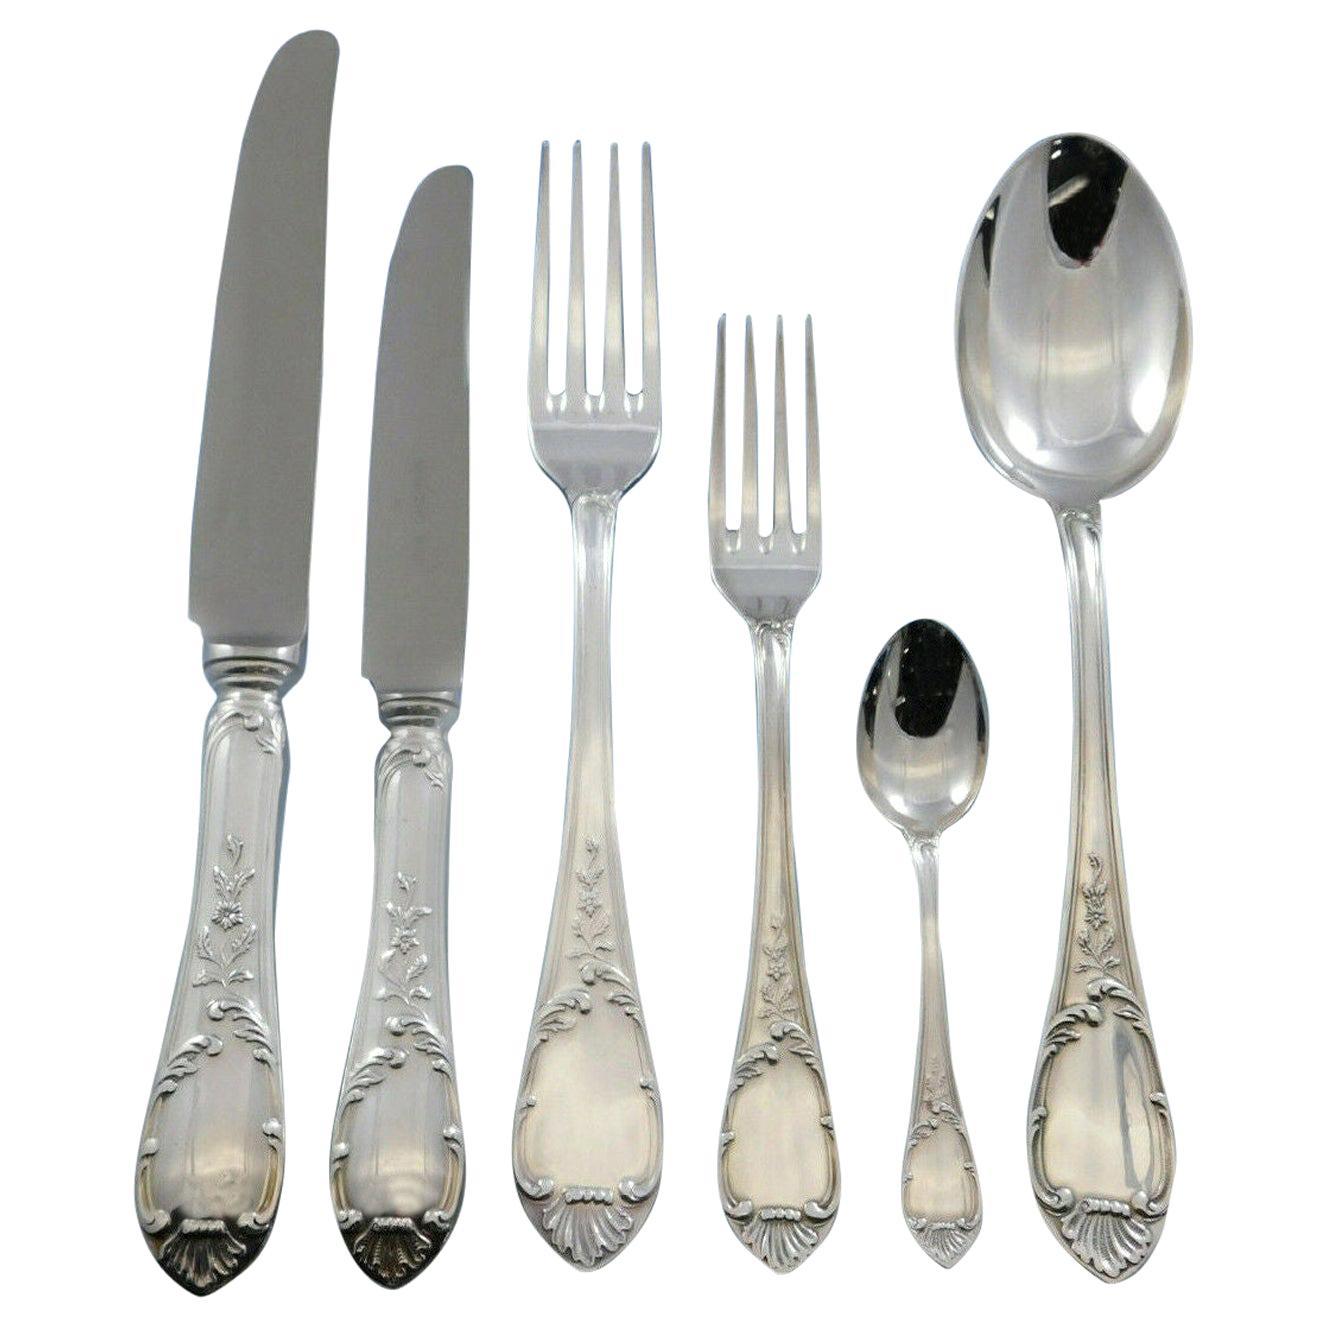 Luigi XVI by Calegaro Italy 800 Silver Flatware Set Service 24 Pieces Dinner